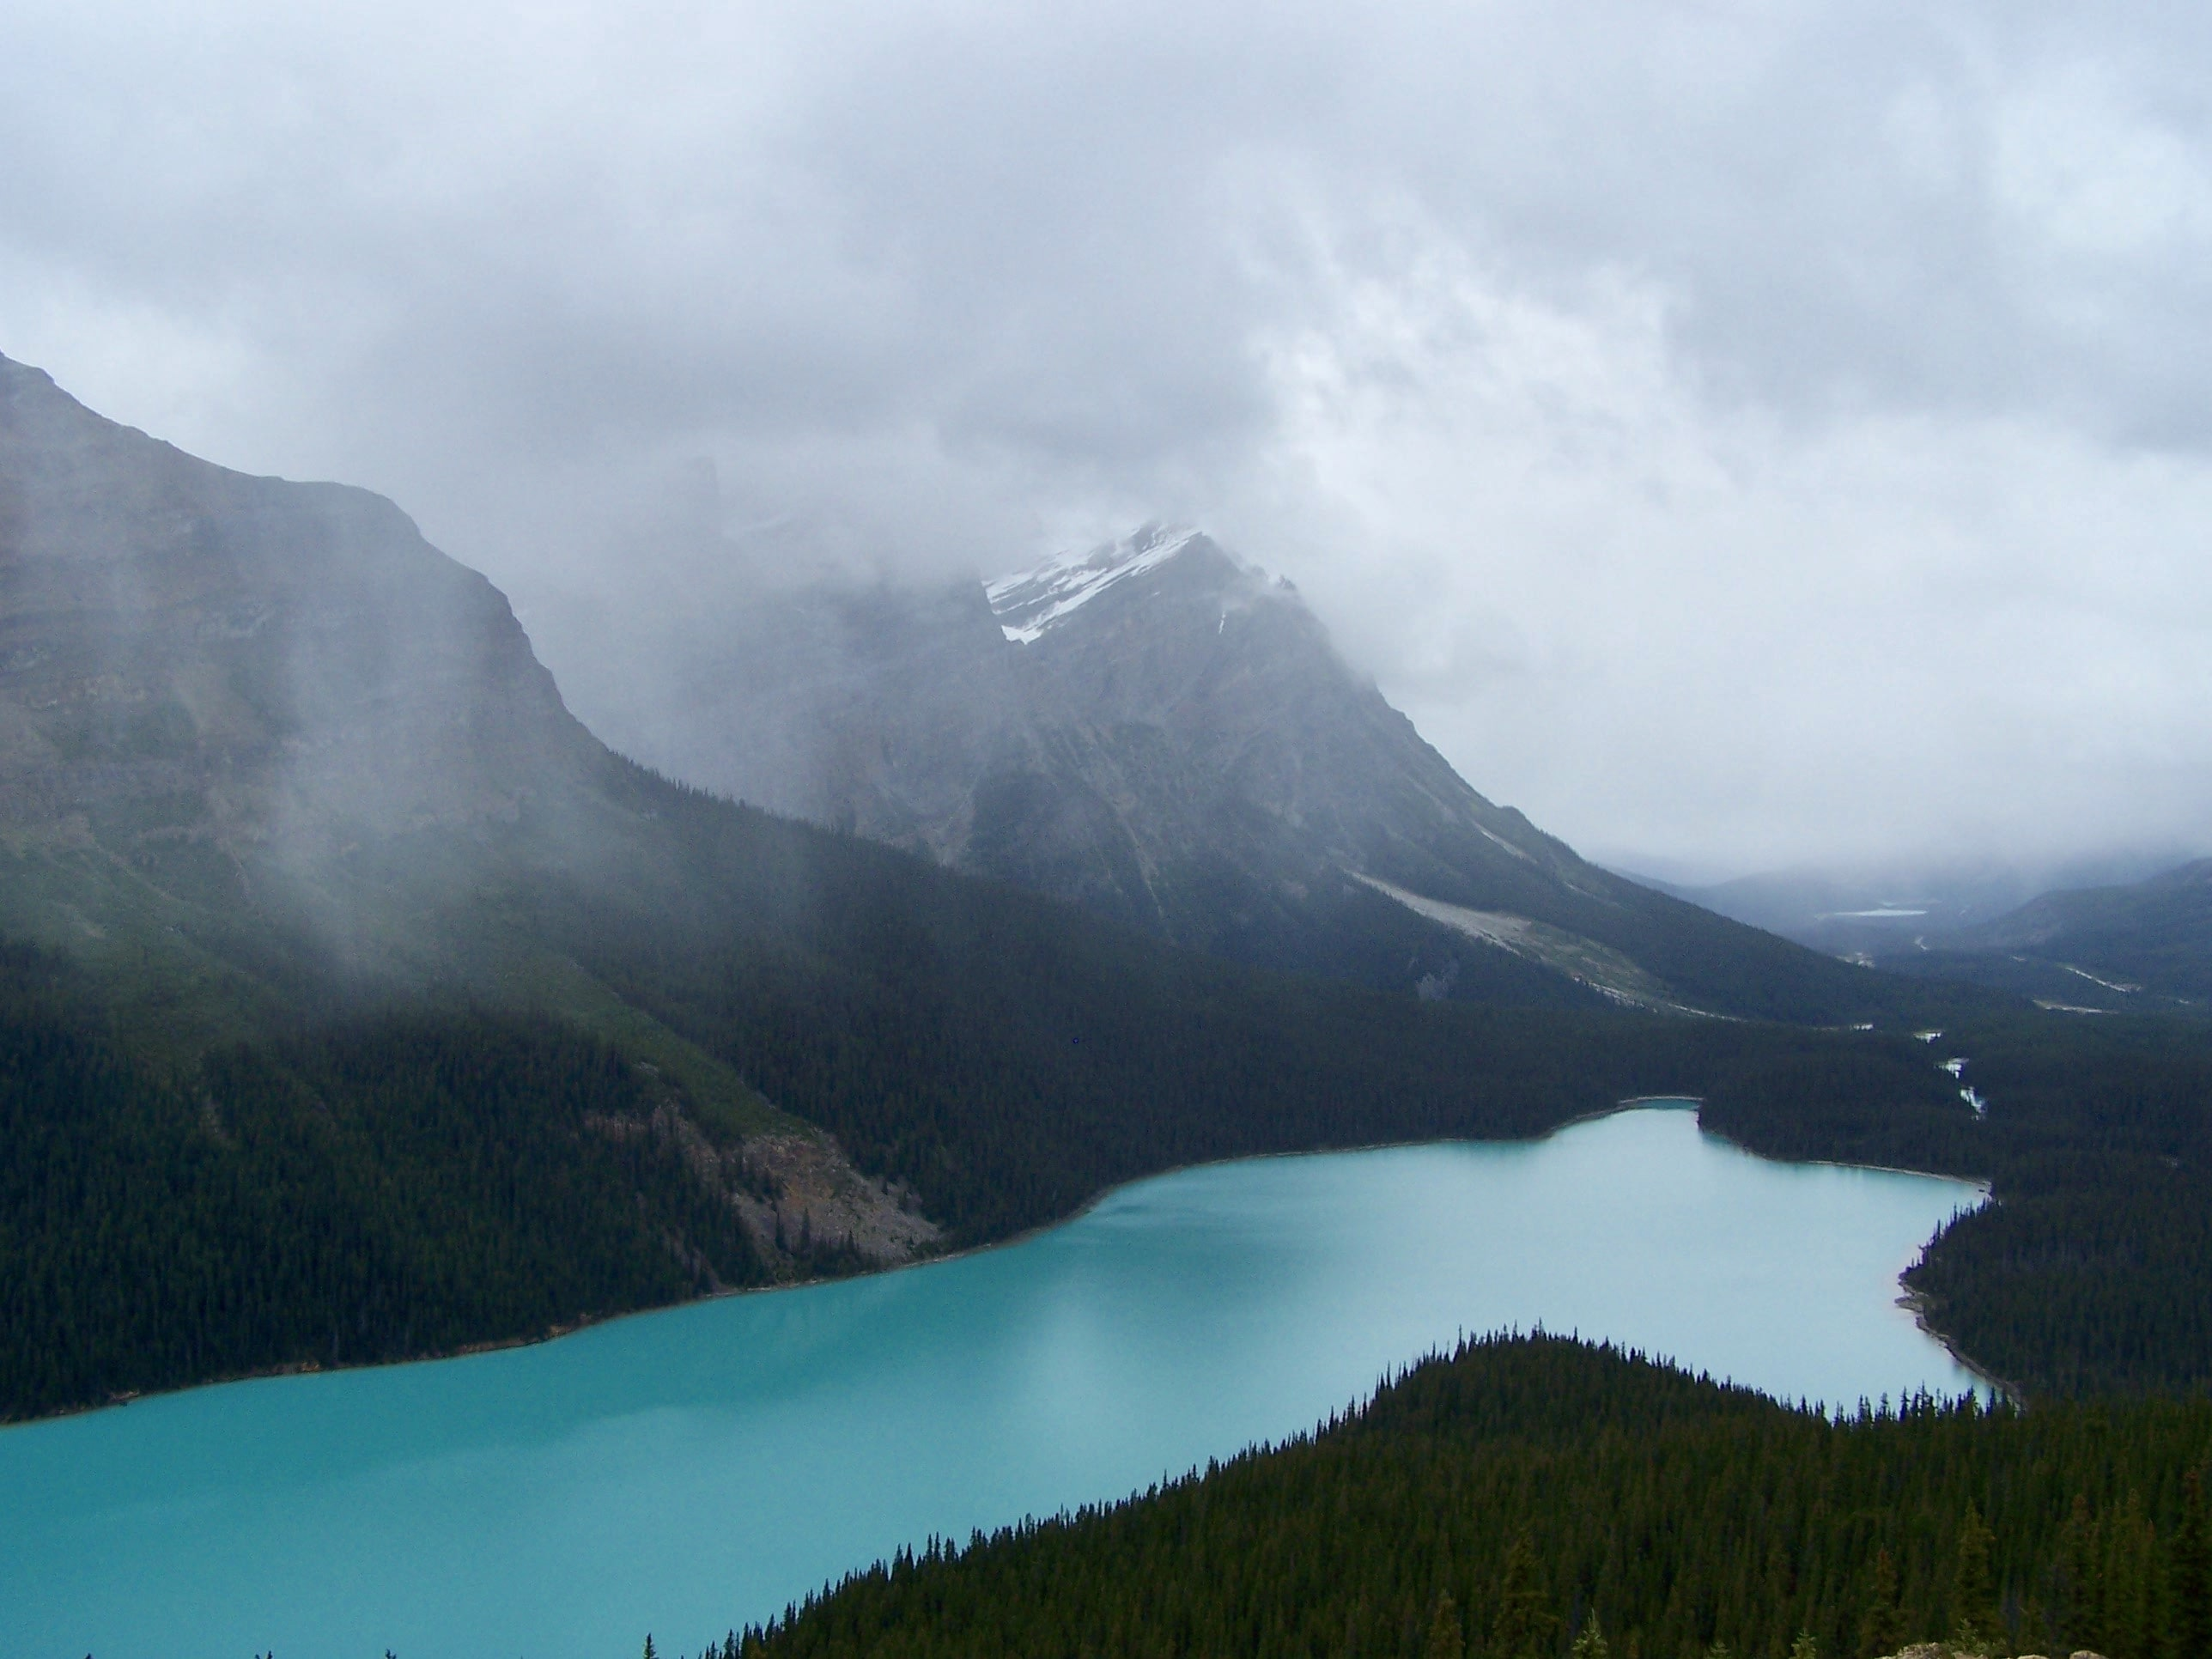 The beautiful Peyto Lake in British Columbia under gray clouds